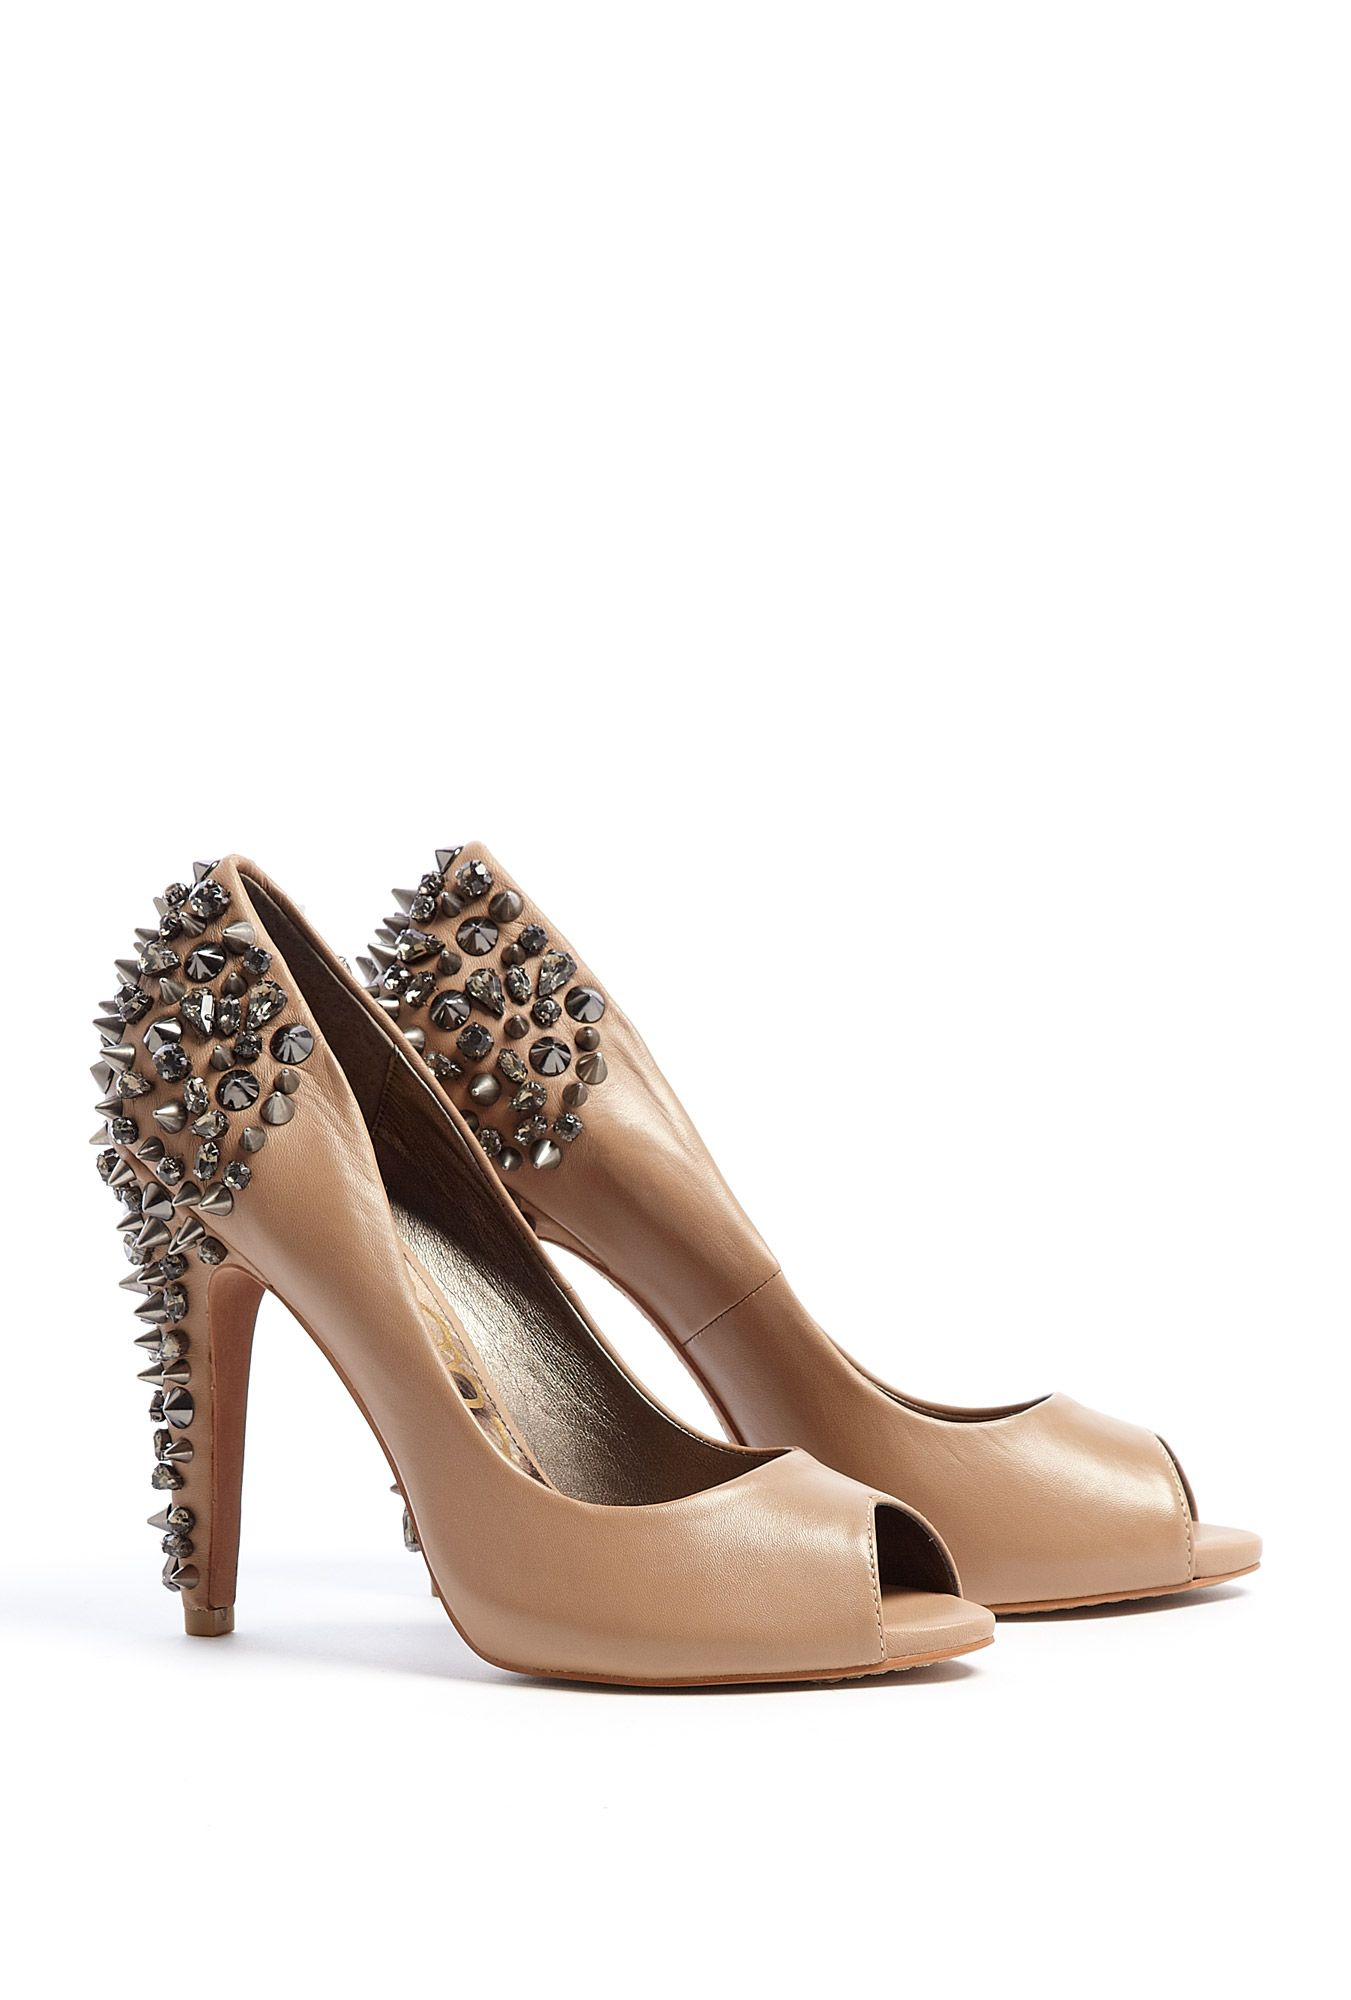 54b3da899 Nude Lorissa Peeptoe Court Shoe with Studded Heel by Sam Edelman ...